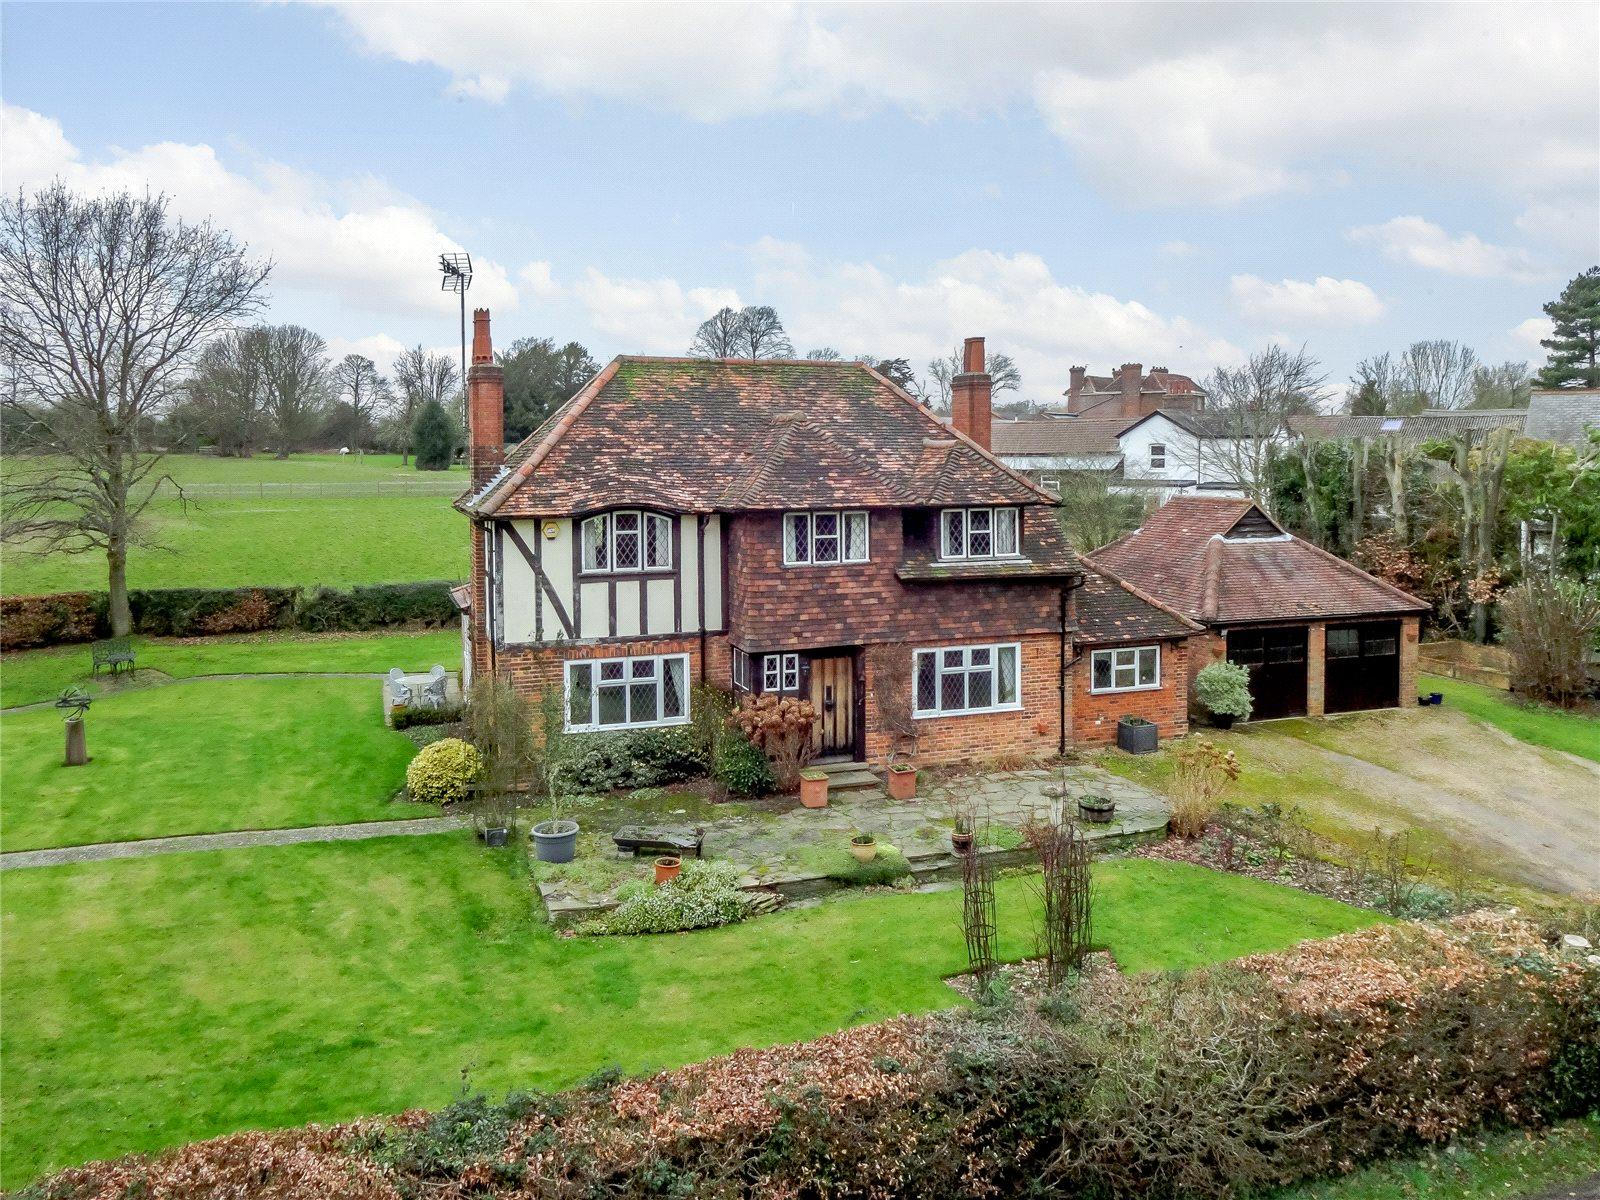 Maison unifamiliale pour l Vente à Redbourn Lane, Harpenden, Hertfordshire, AL5 Harpenden, Angleterre